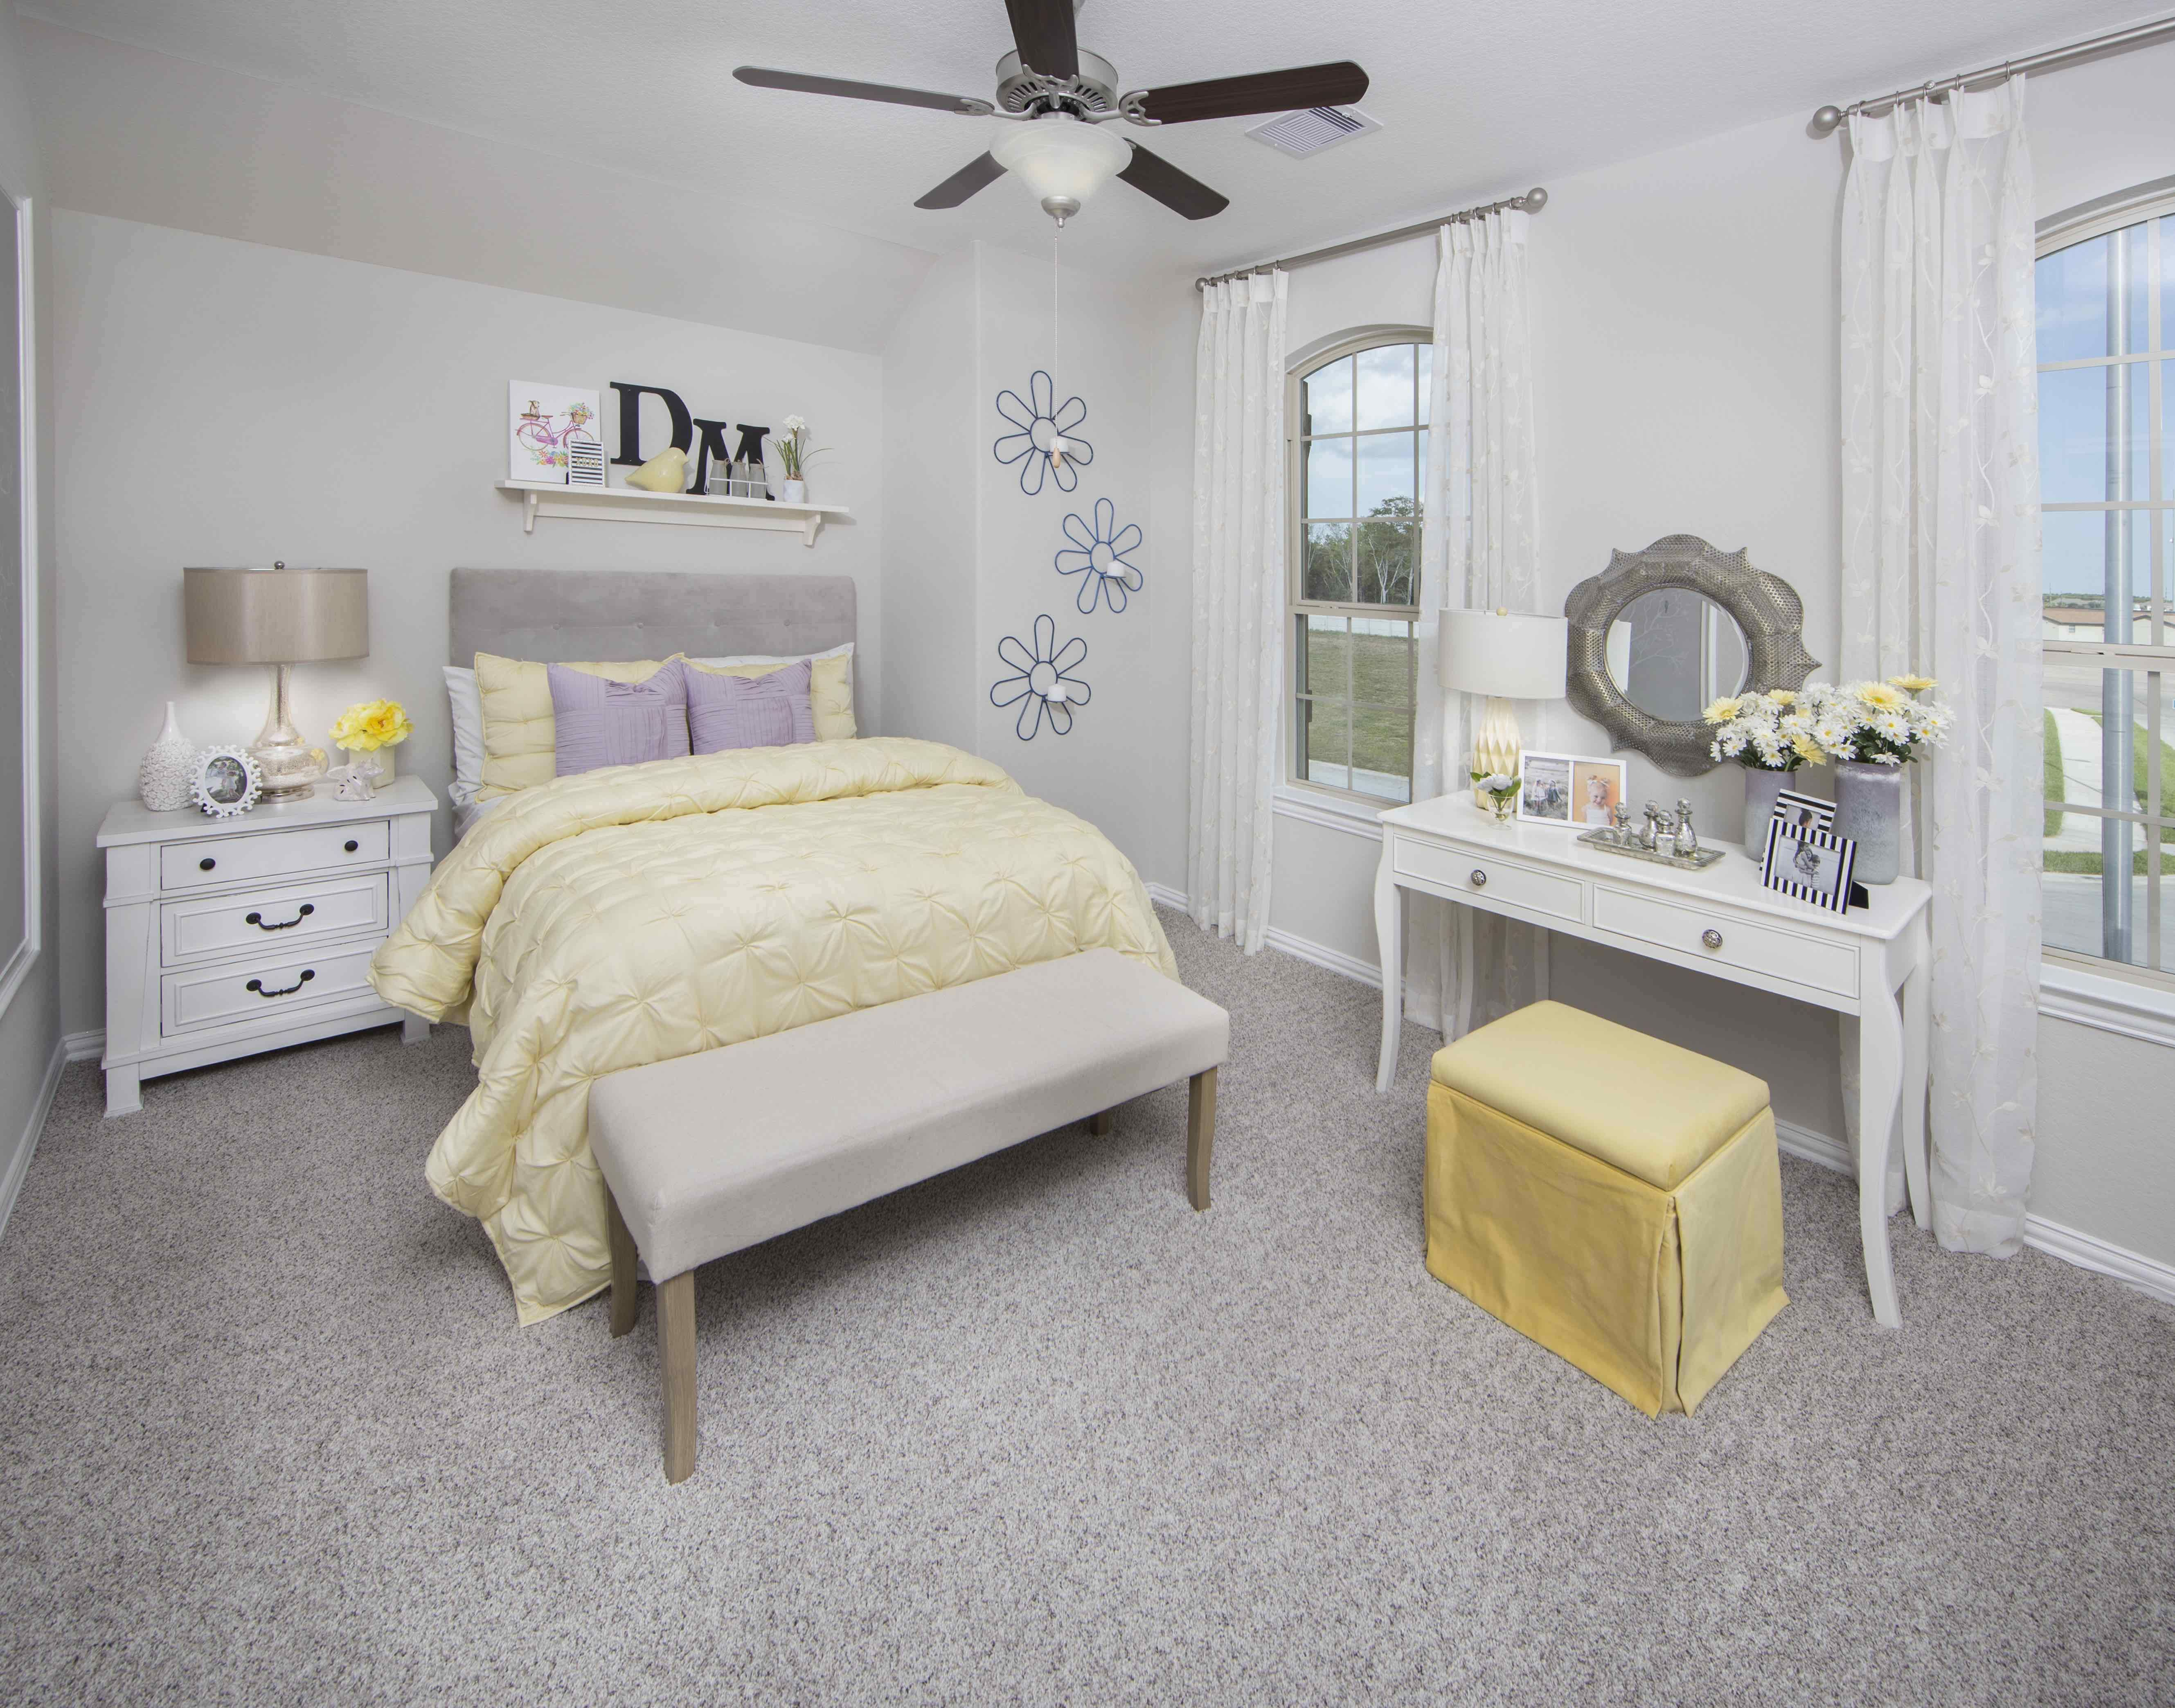 Lennar in 2020 | New home communities, Home, Girl bedroom ... on New Model Bedroom Design  id=61254